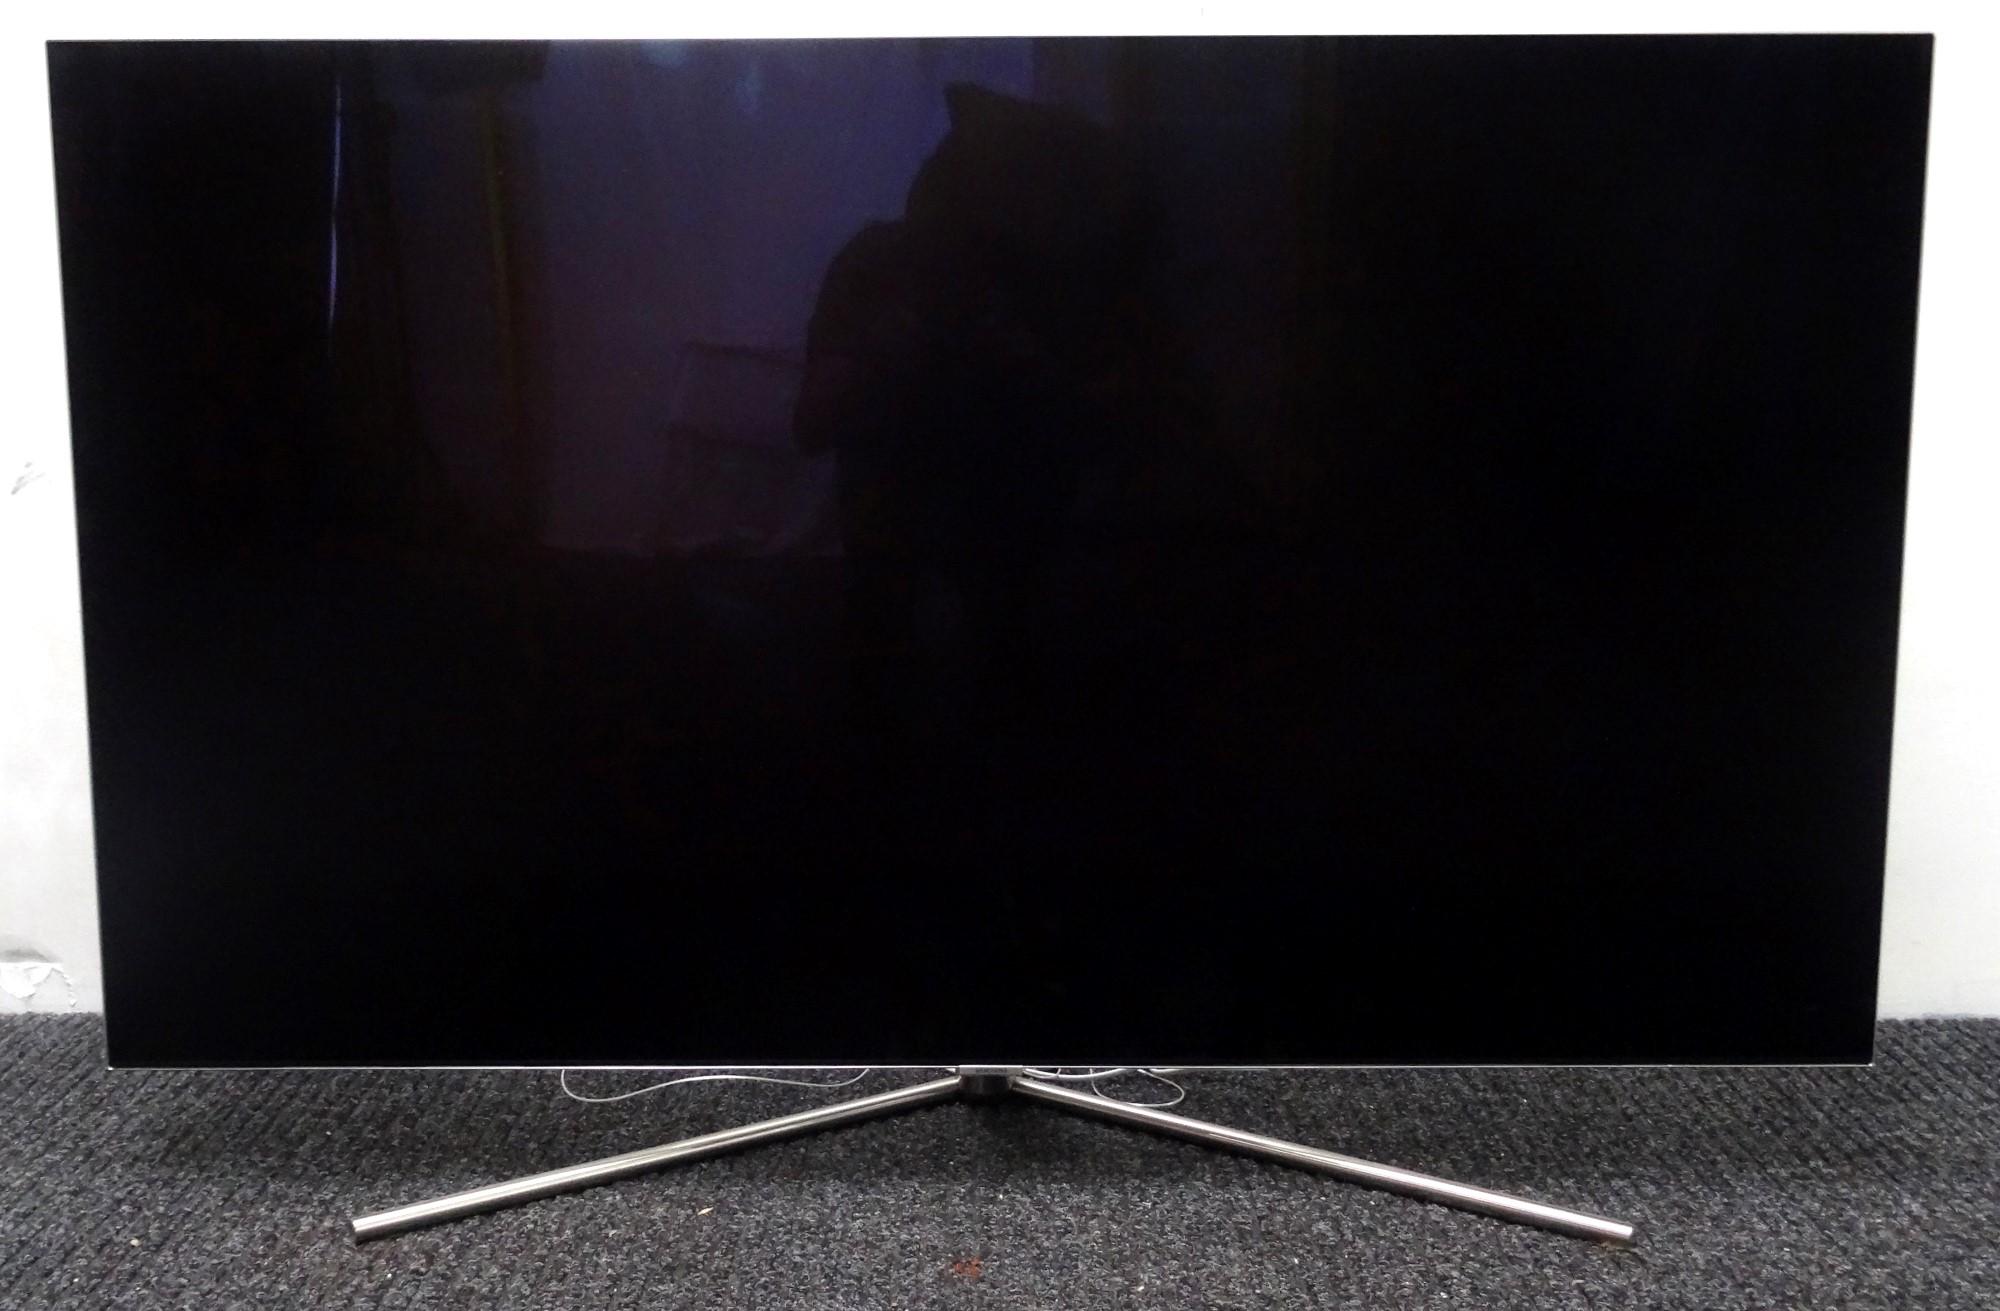 Samsung Series 7 55 inch Q7 UHD QLED TV 55 inch SILVER